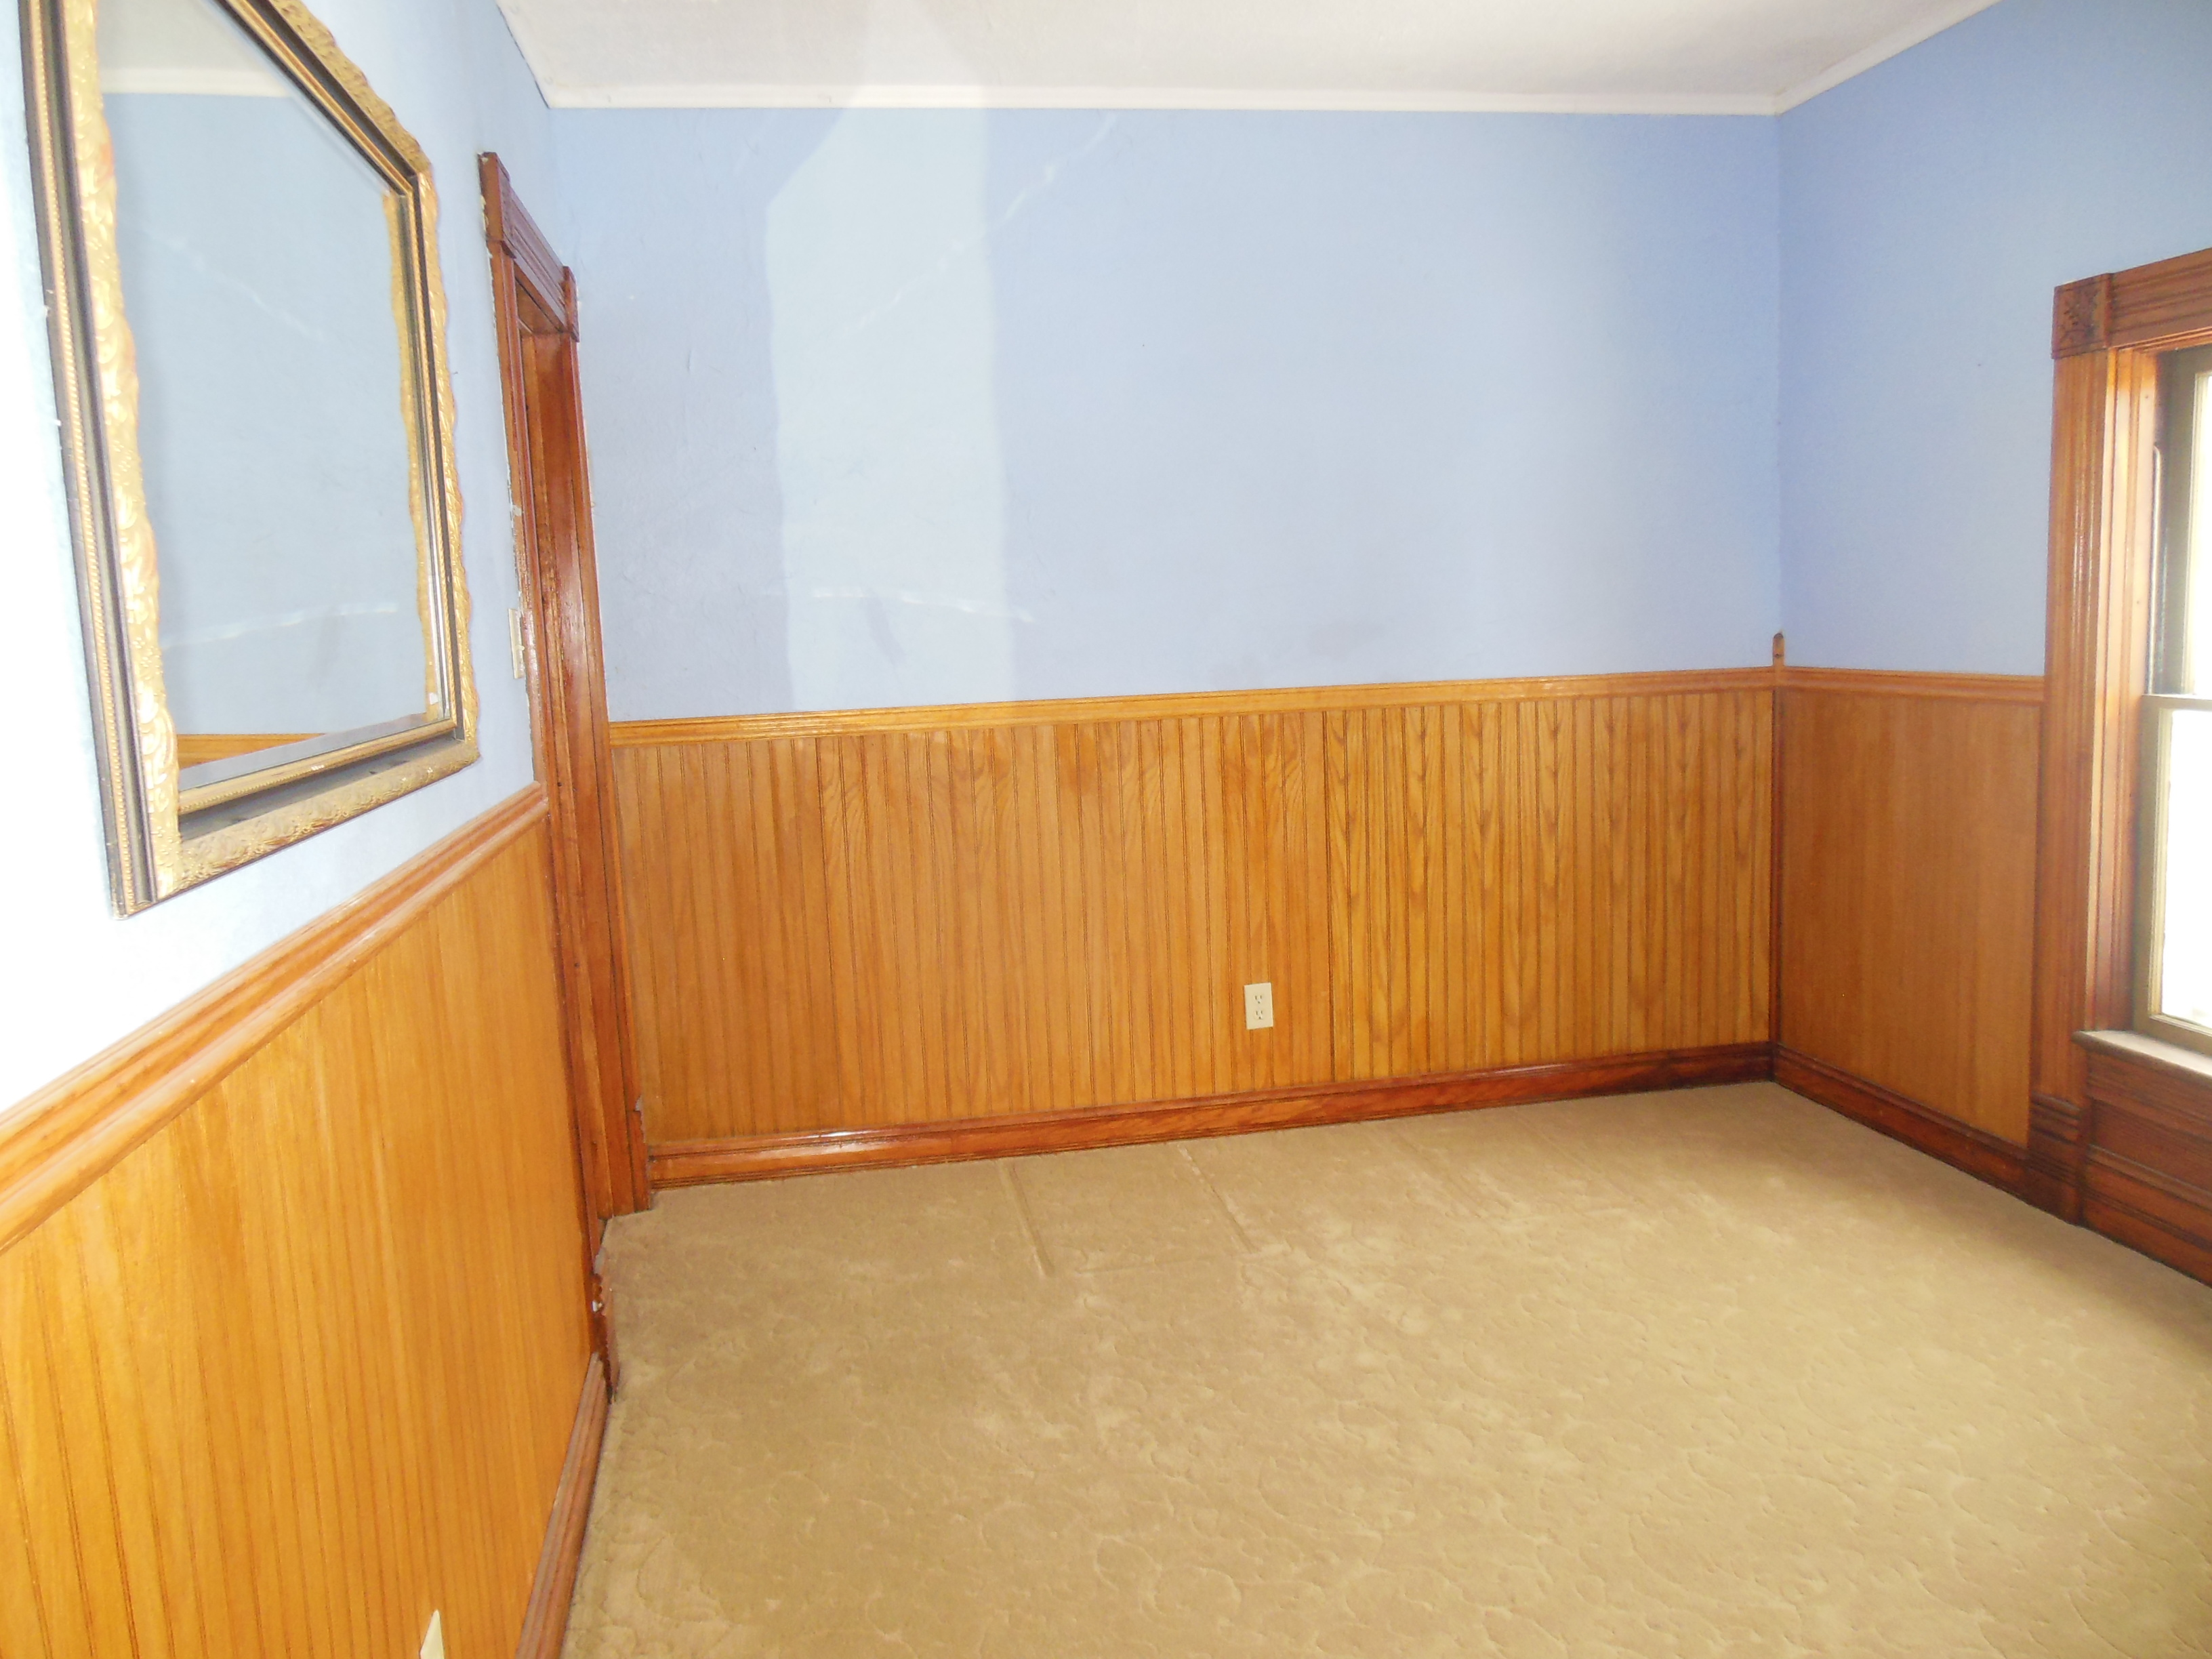 509 Normal, Upstairs bedroom (2)